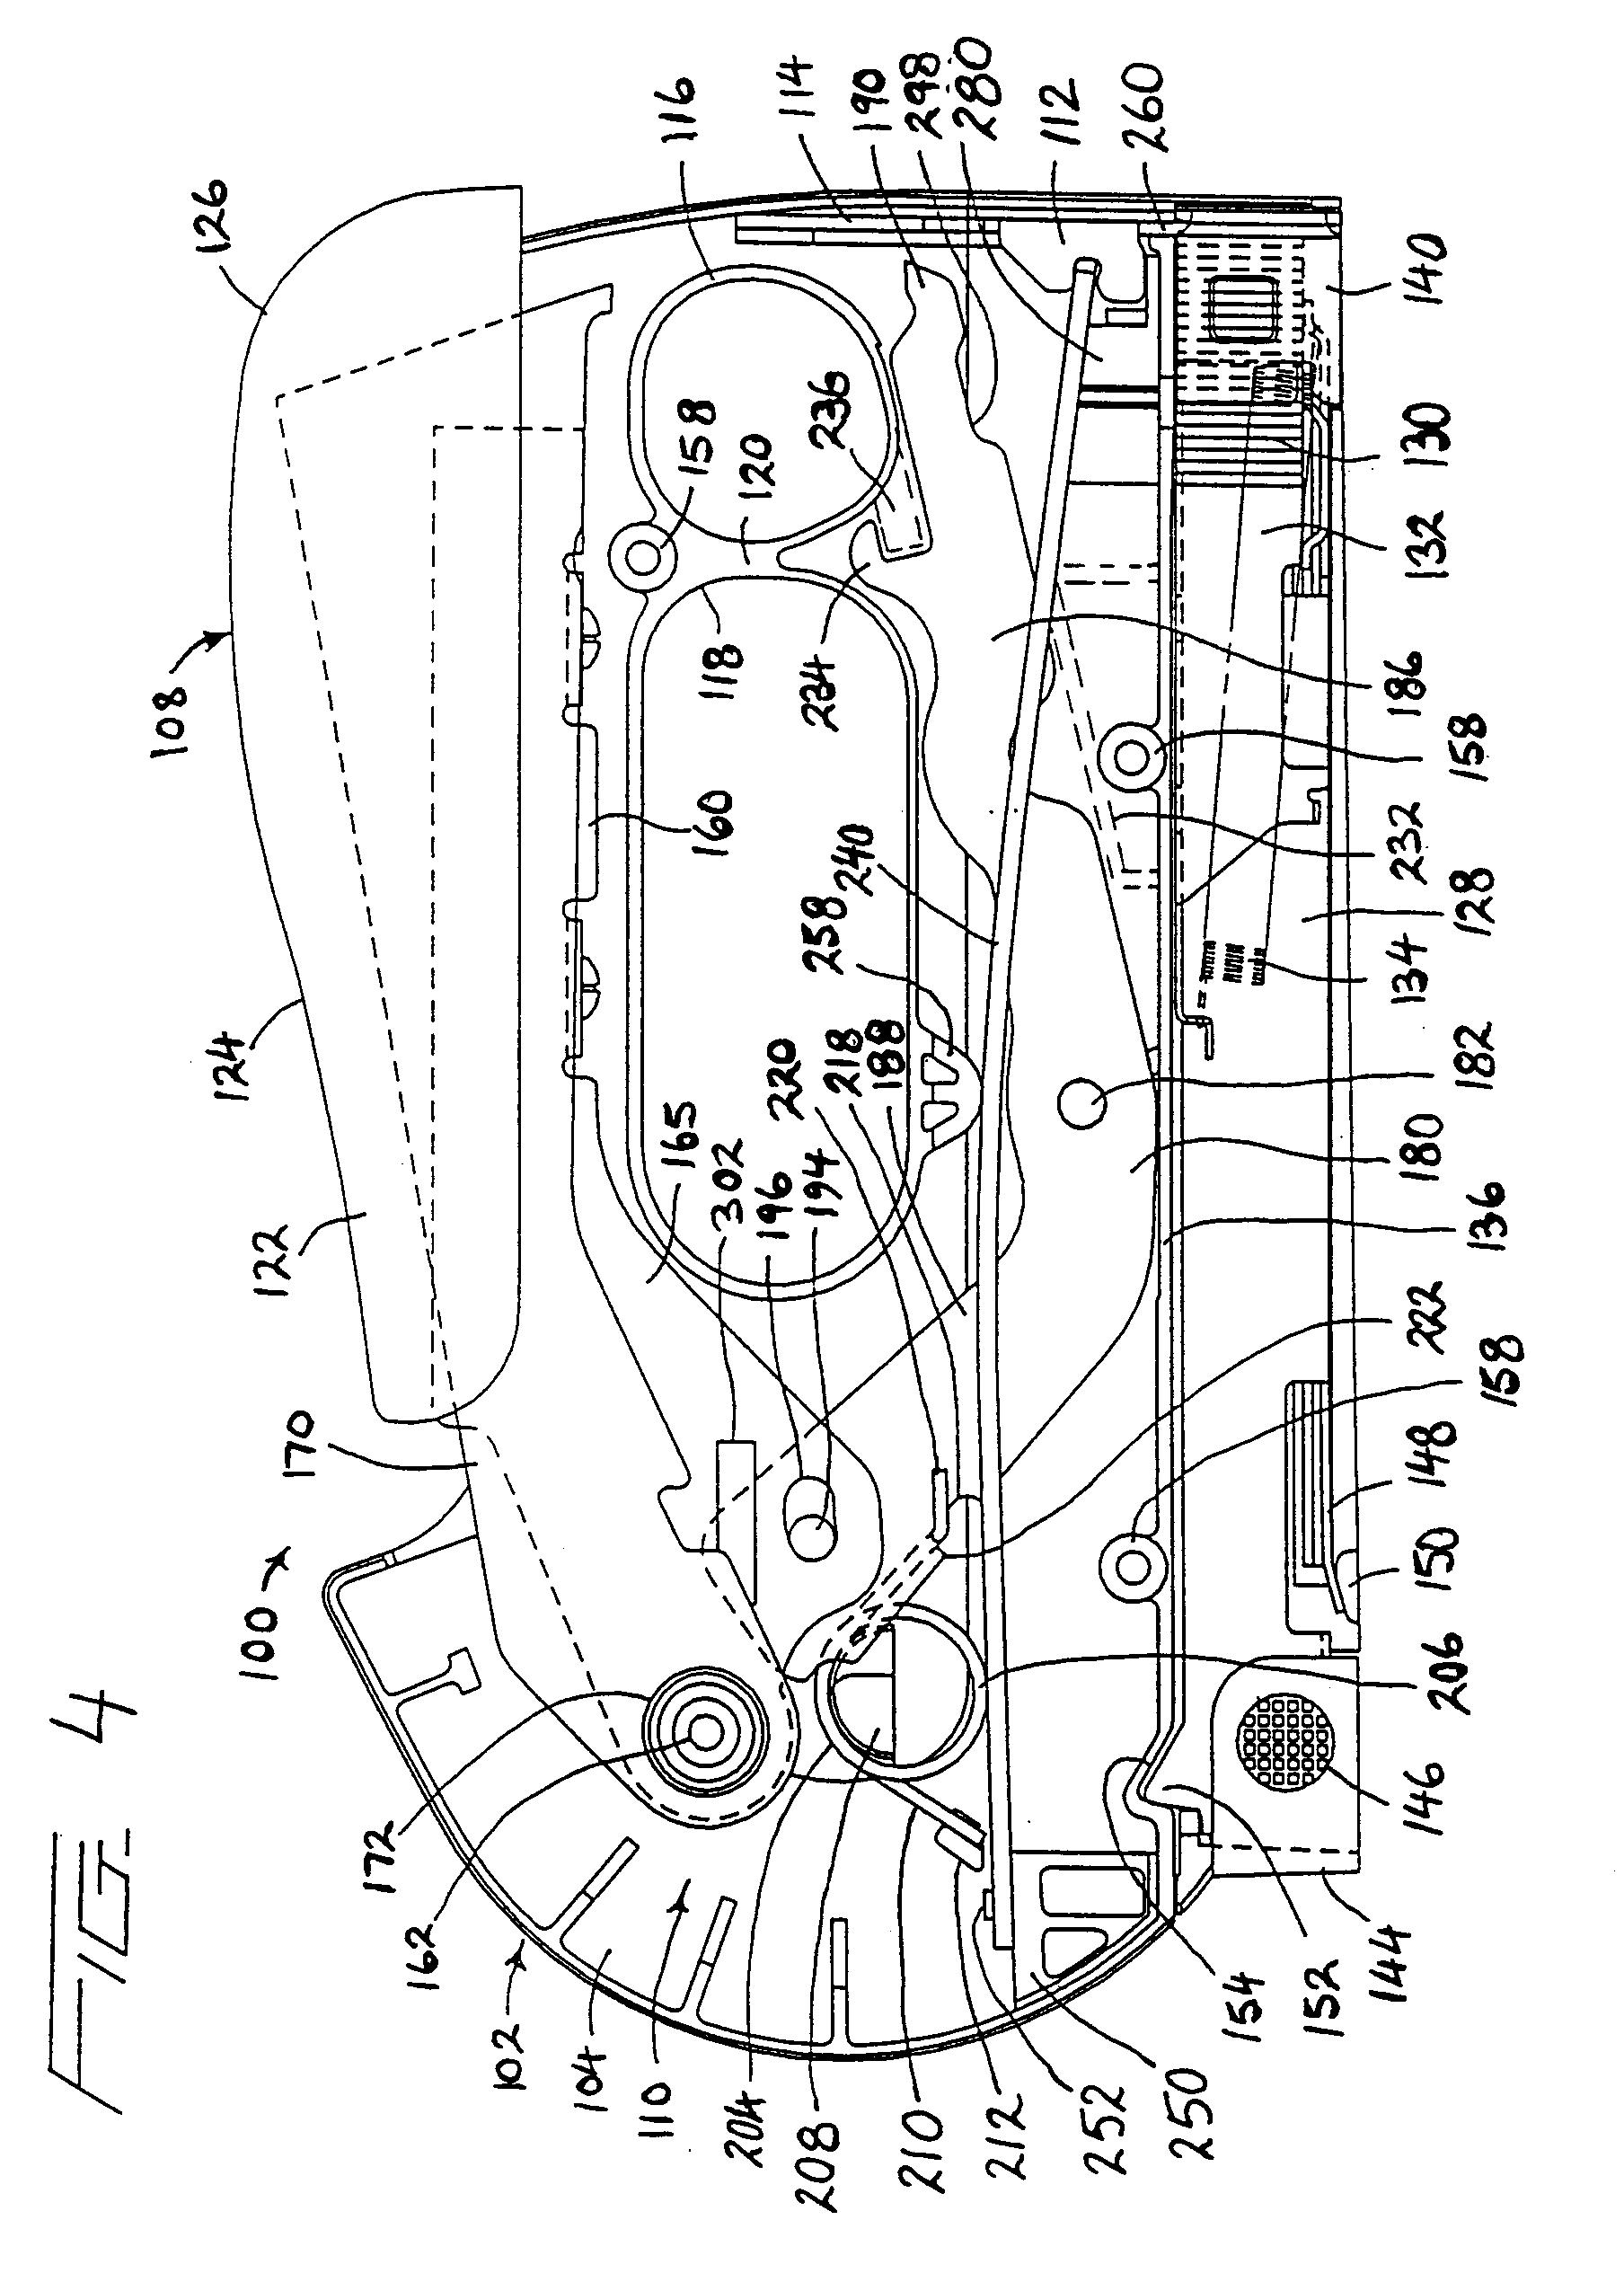 staple gun parts diagram staple gun light   elsavadorla hitachi tv instructions manual Sony STR De475 Manual